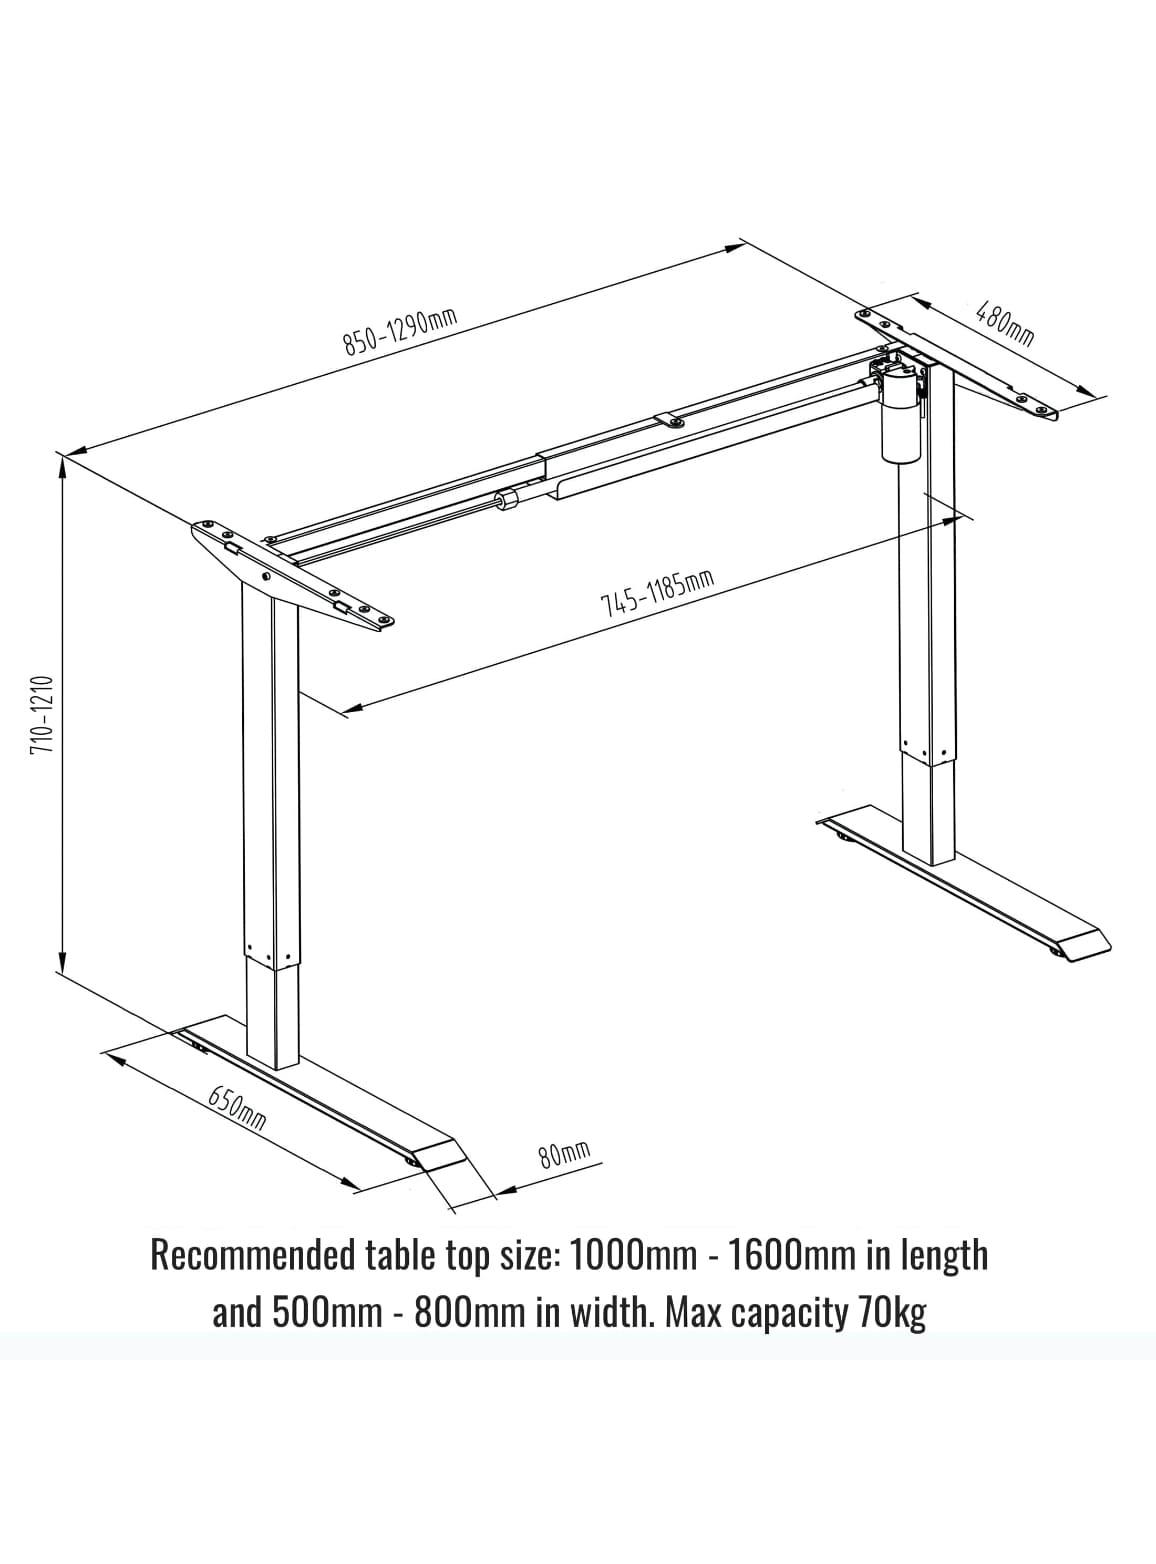 Picture of: Sierra Standing Desk Starter Electric Standing Desk Fitnest Europe Standing Desks